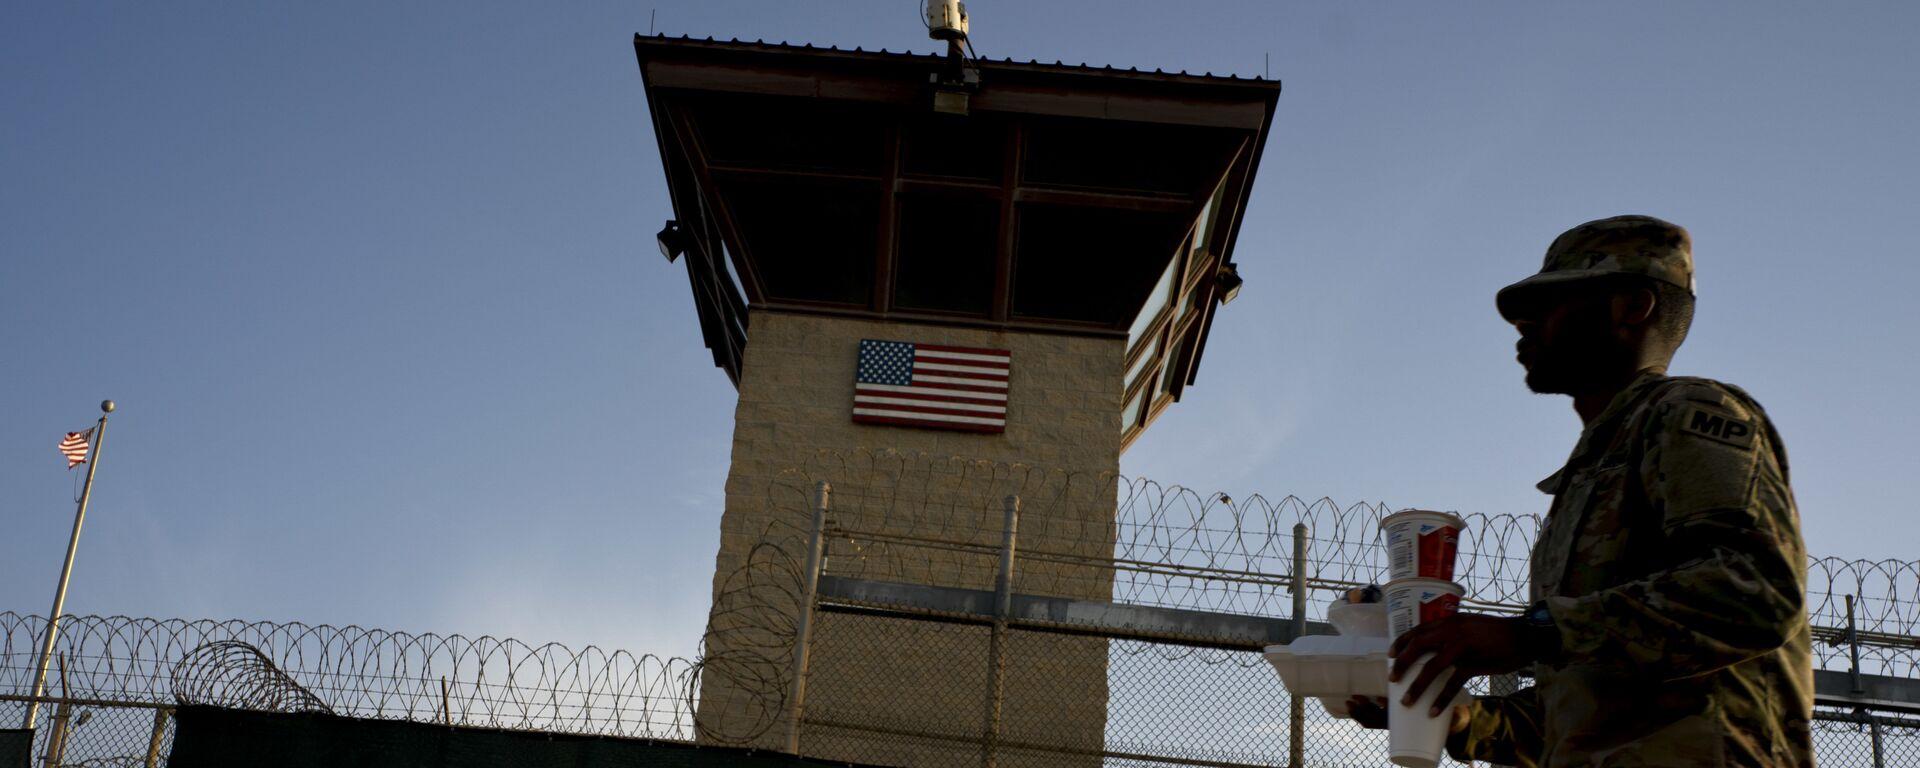 La base naval de la bahía de Guantánamo - Sputnik Mundo, 1920, 08.04.2021